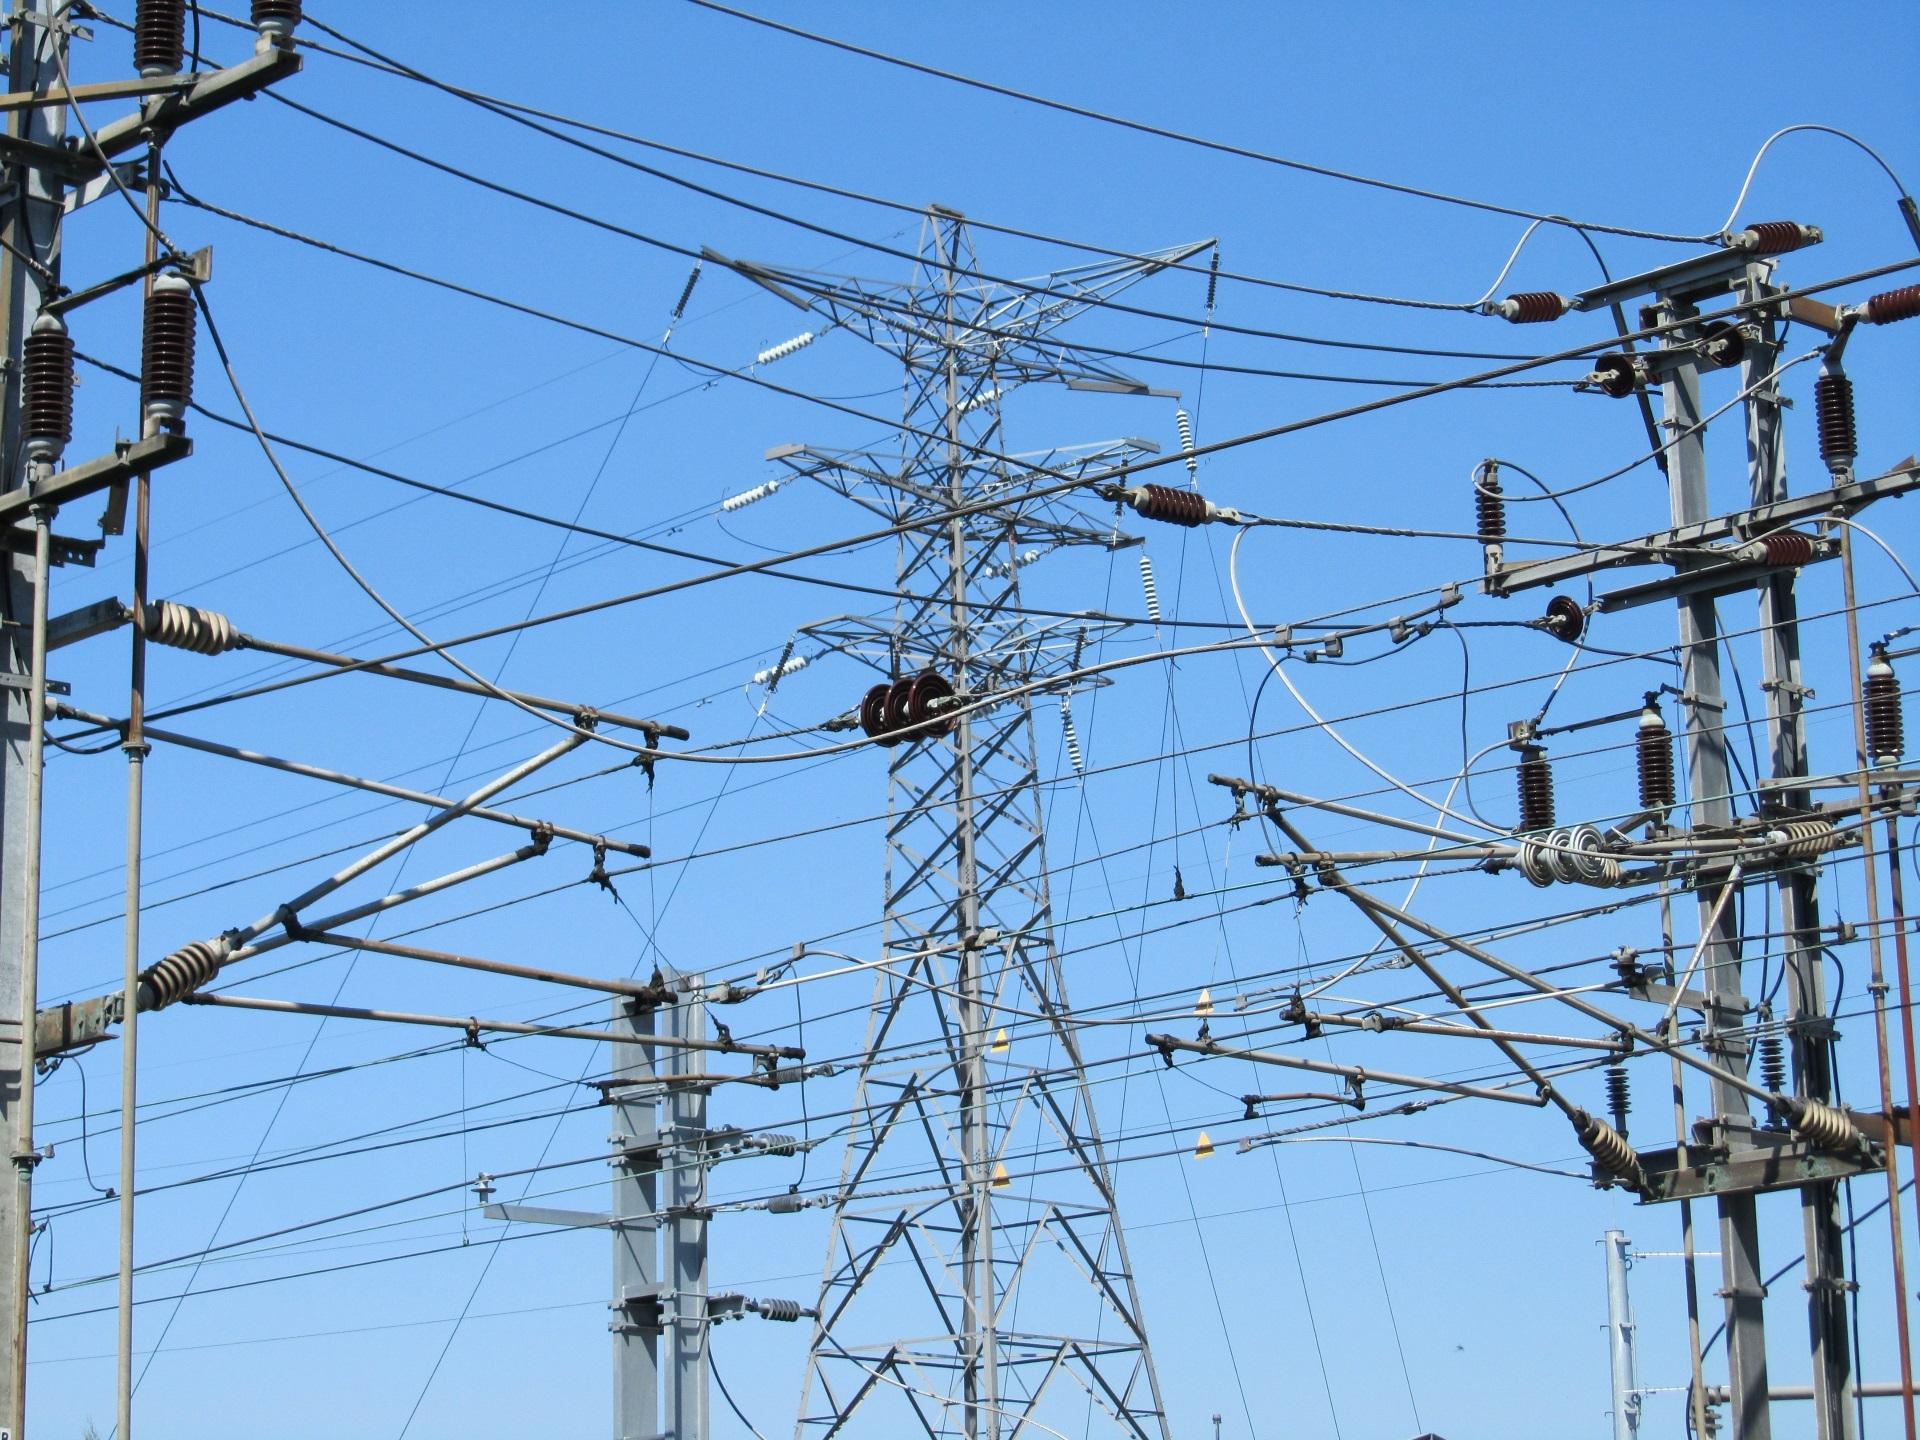 Kostenlose foto : Linie, Turm, Mast, Industrie, Elektrizität ...